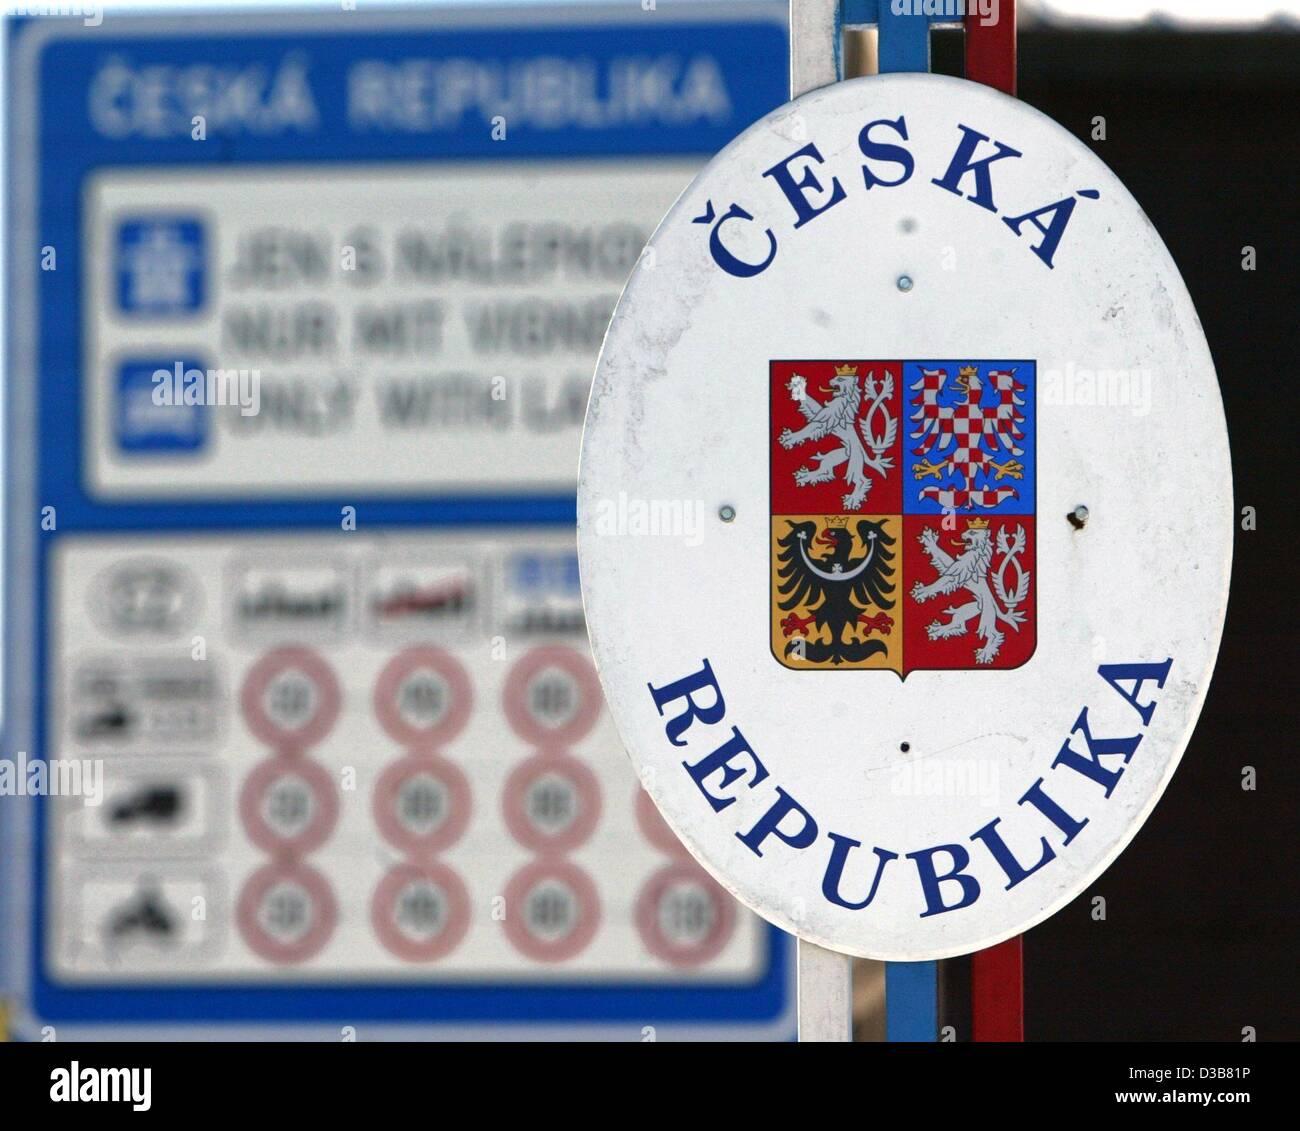 (dpa) - A sign reading 'Ceska Republika' marks the EU border to the Czech Republic near the town of Oberwiesenthal Stock Photo